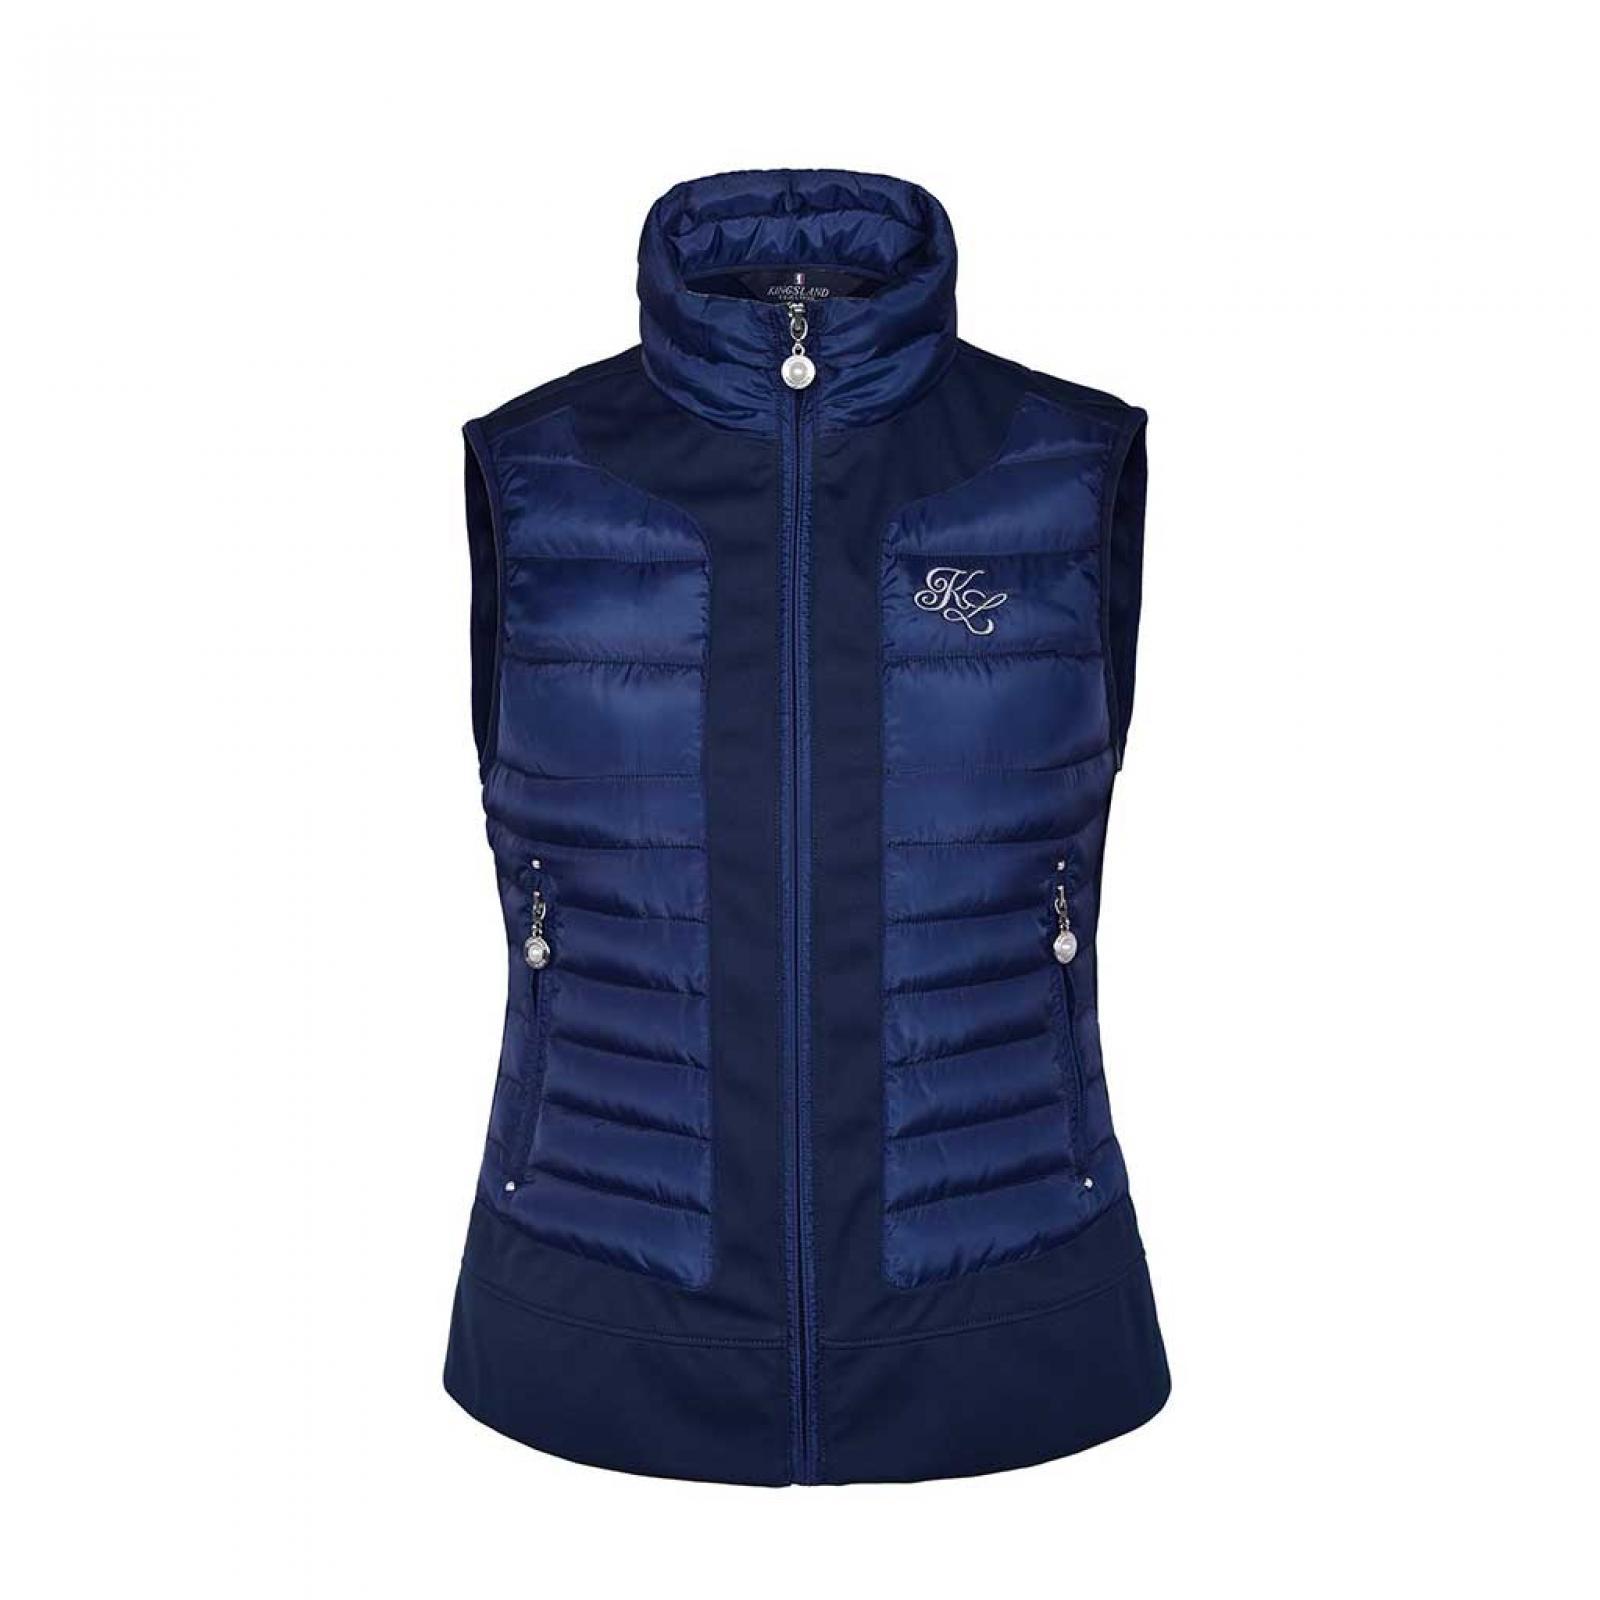 Kingsland Juliet Insulated Navy Body Warmer Waistcoat